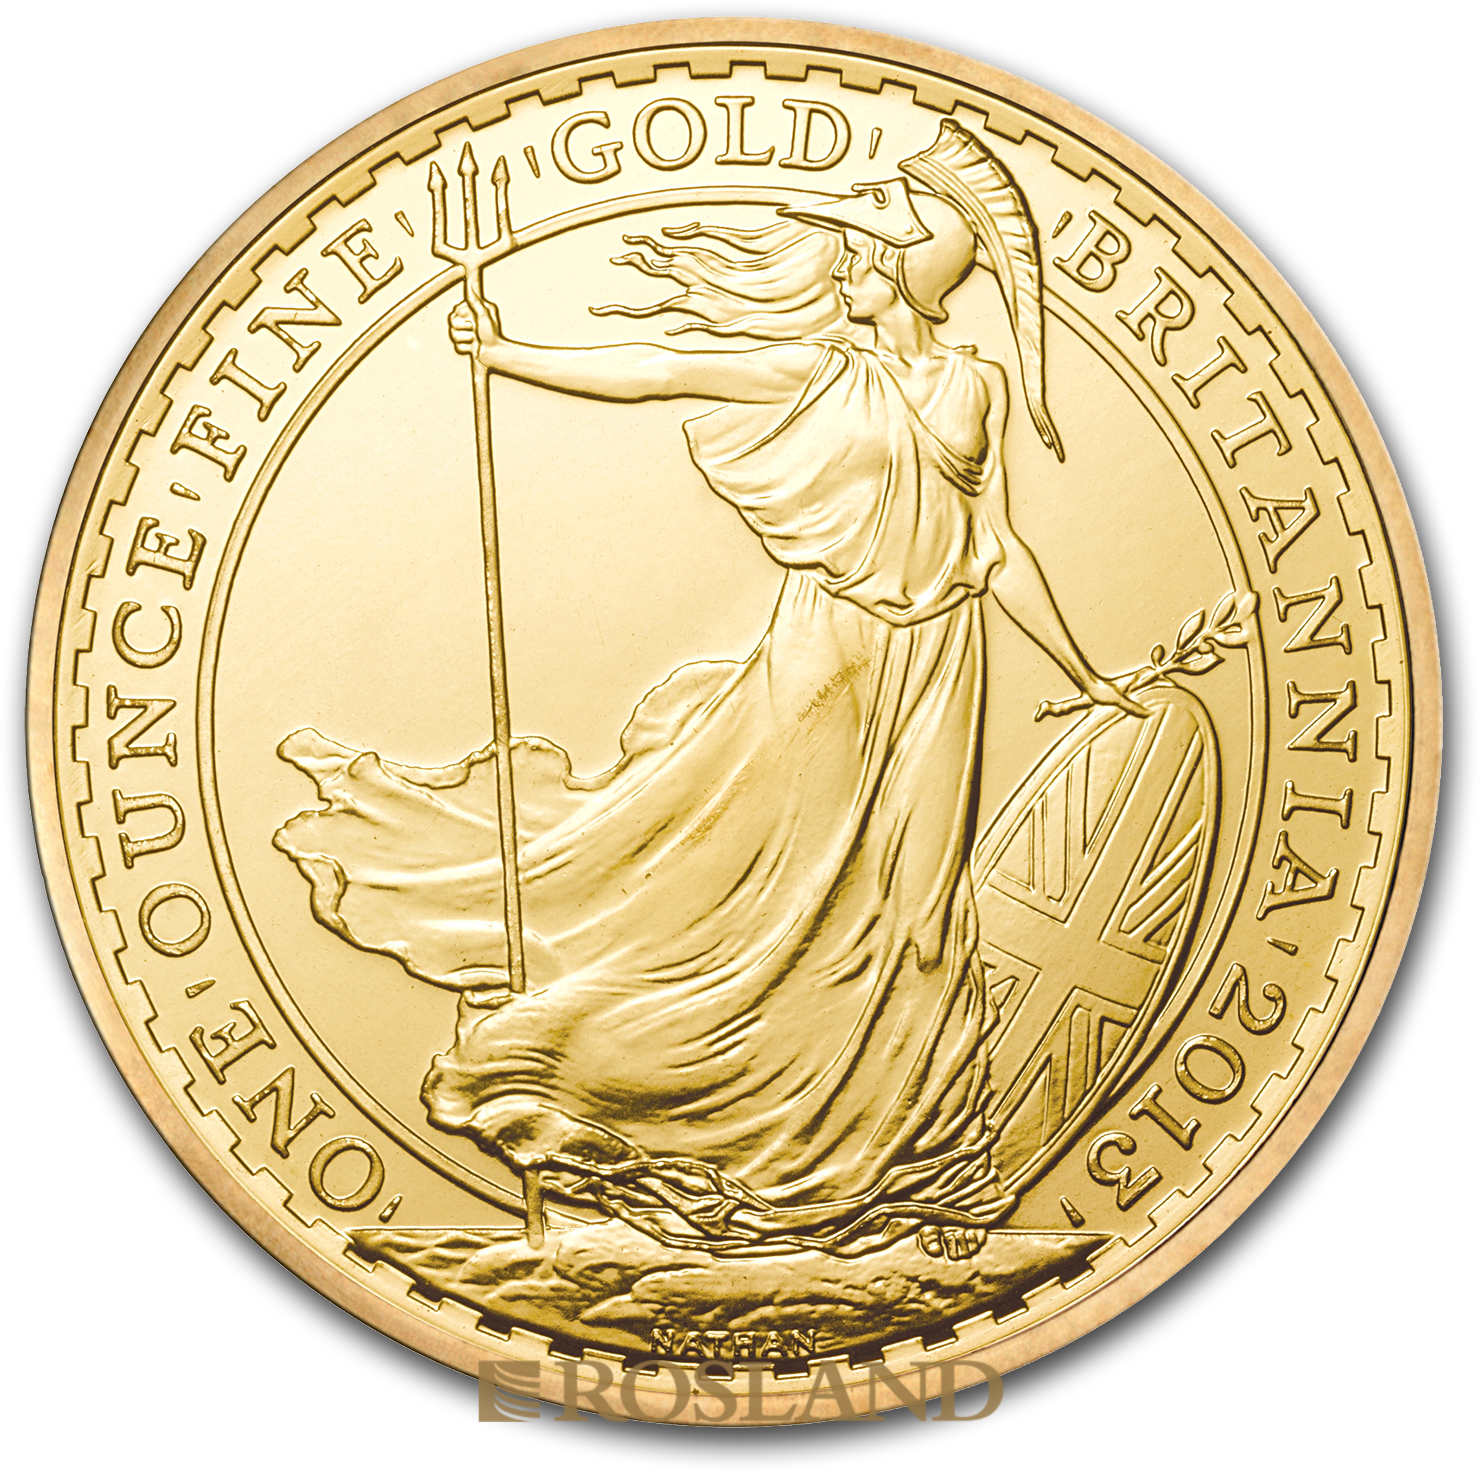 1 Unze Goldmünze Britannia 2013